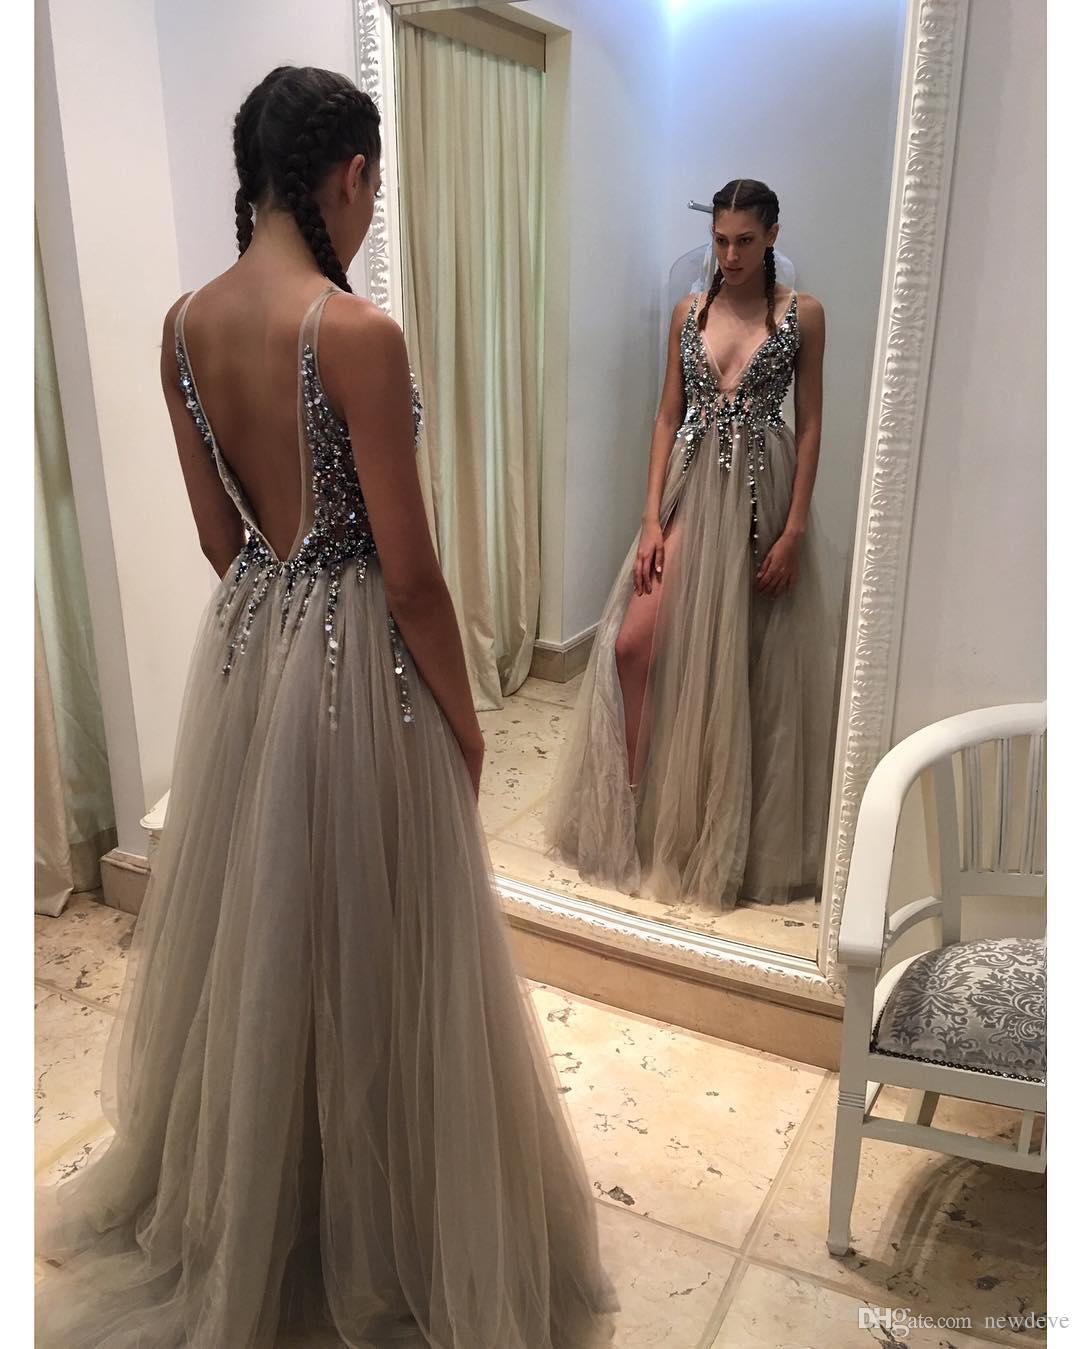 Side Spilt Berta Formal Evening Gowns Beaded Backless Evening Dresses V Neck Sweep Train Prom Dress